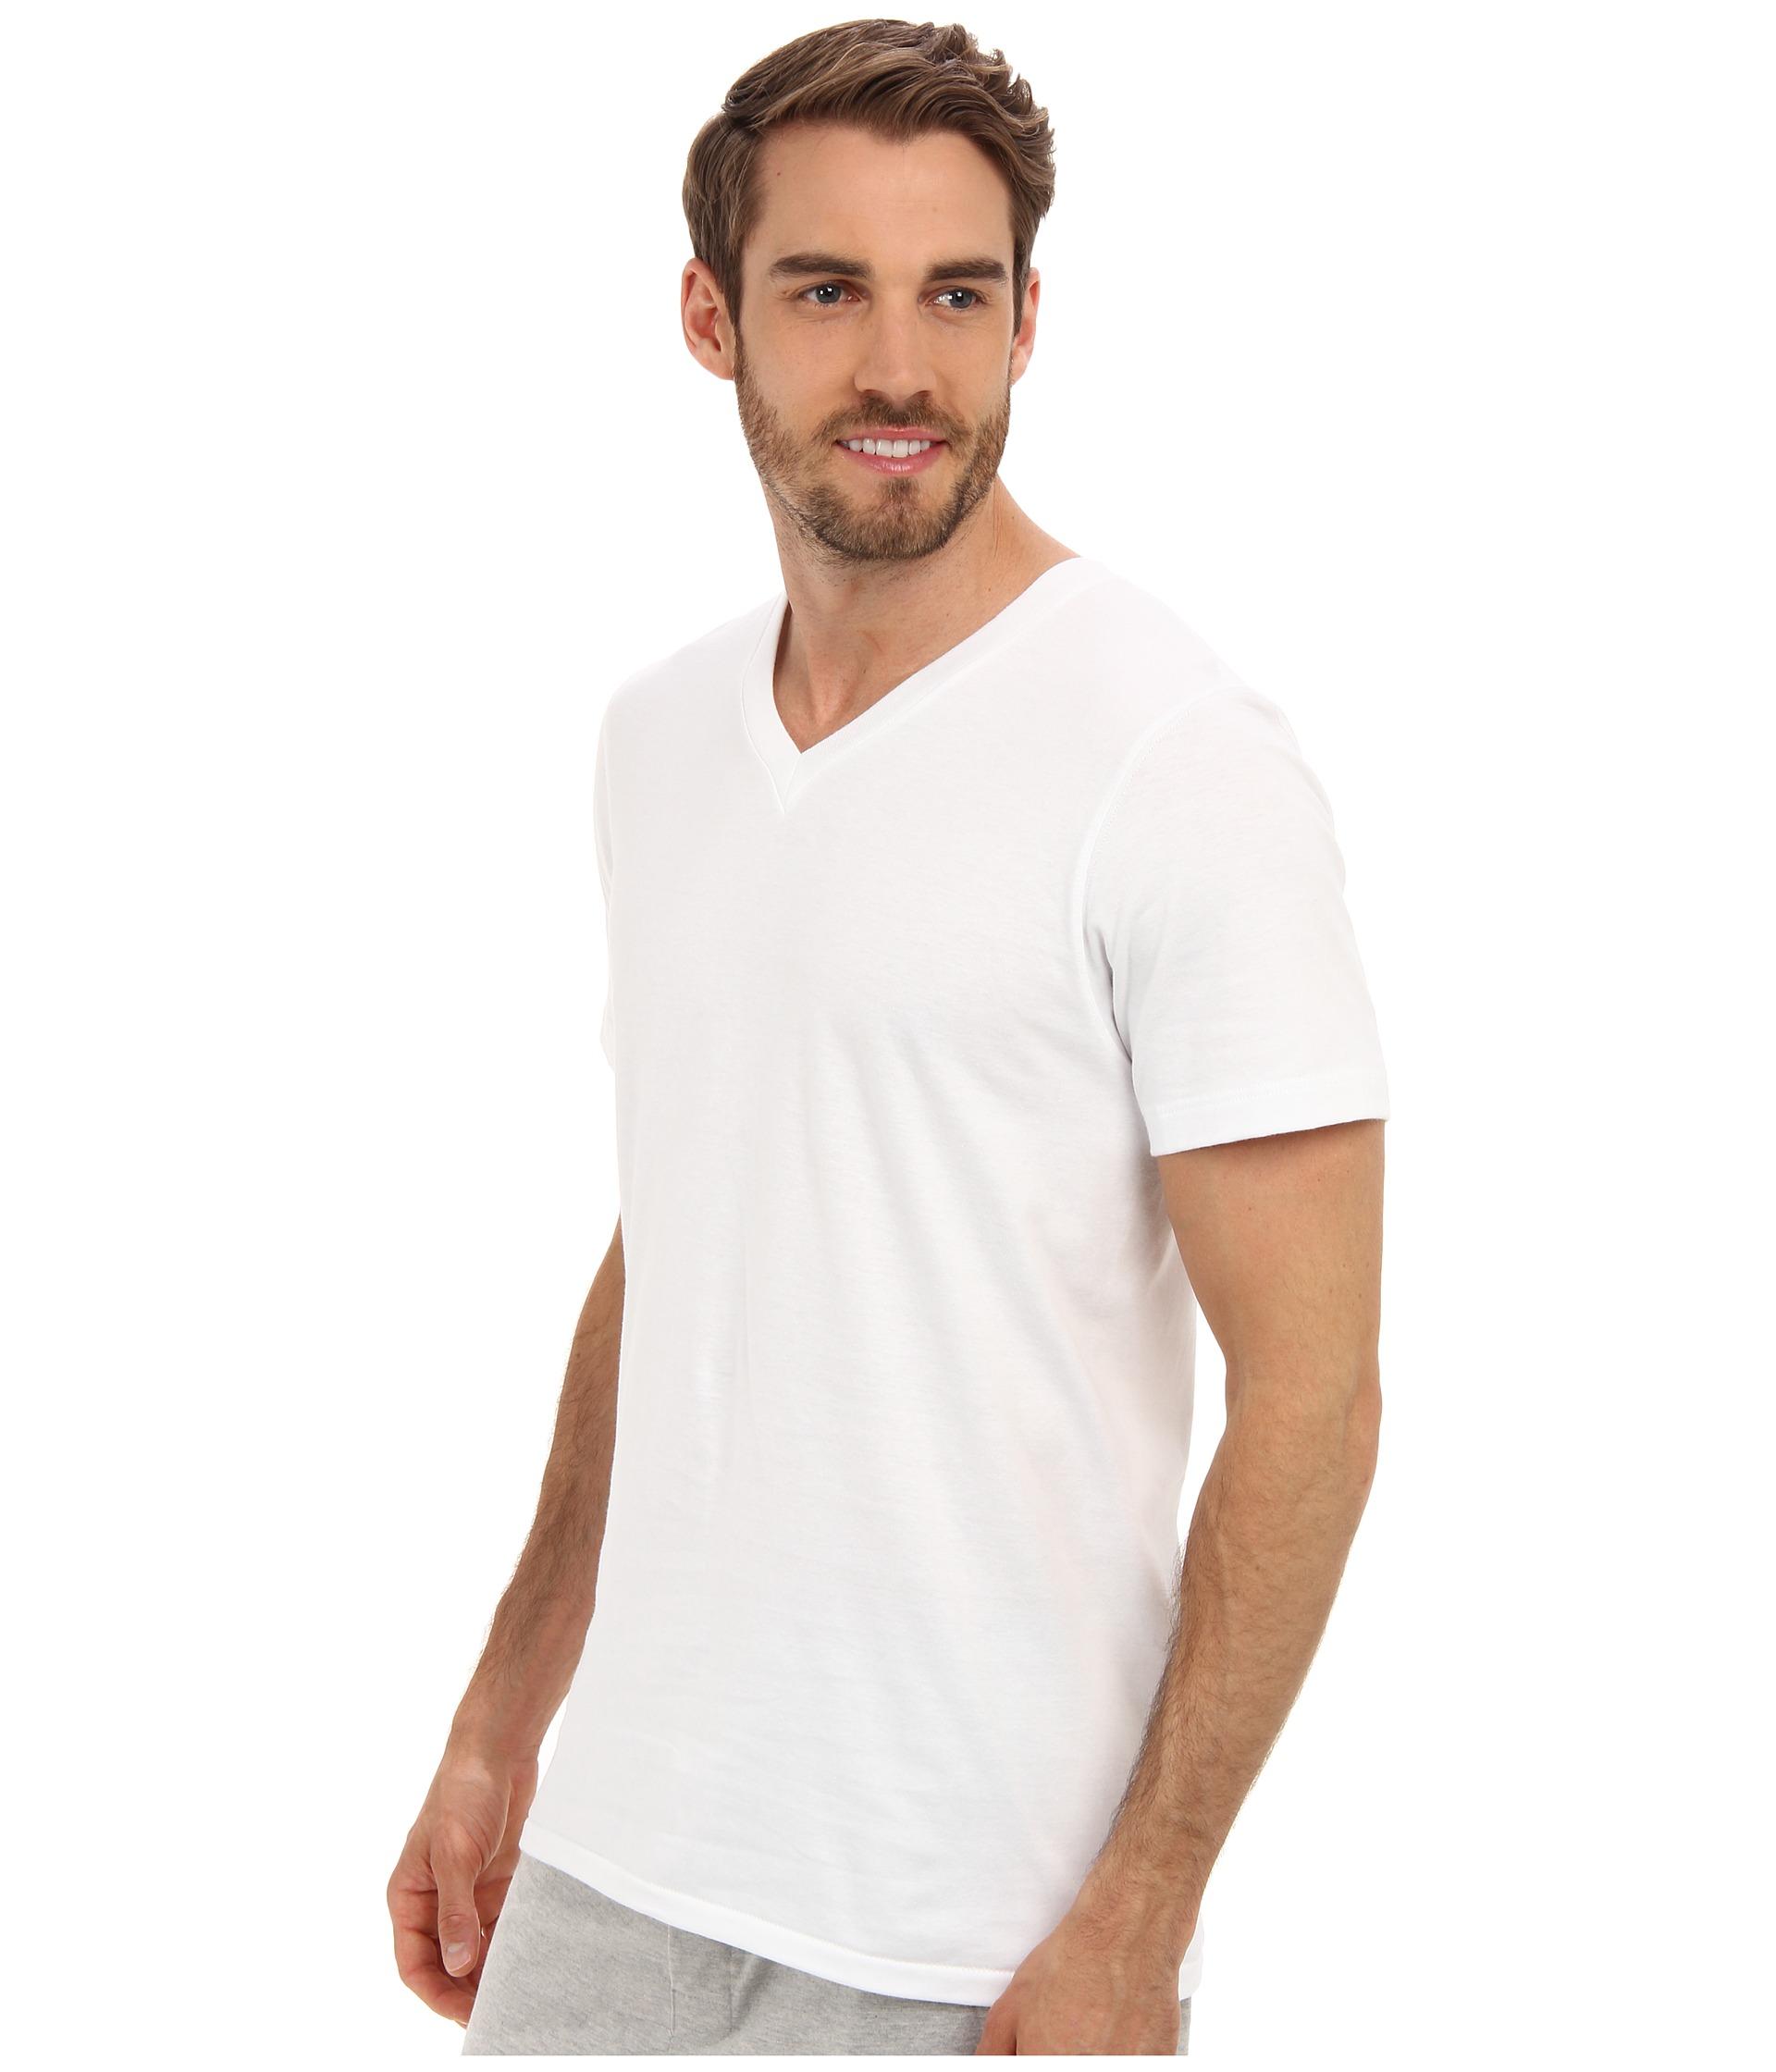 Jockey cotton v neck t shirt 3 pack at for Jockey t shirts sale